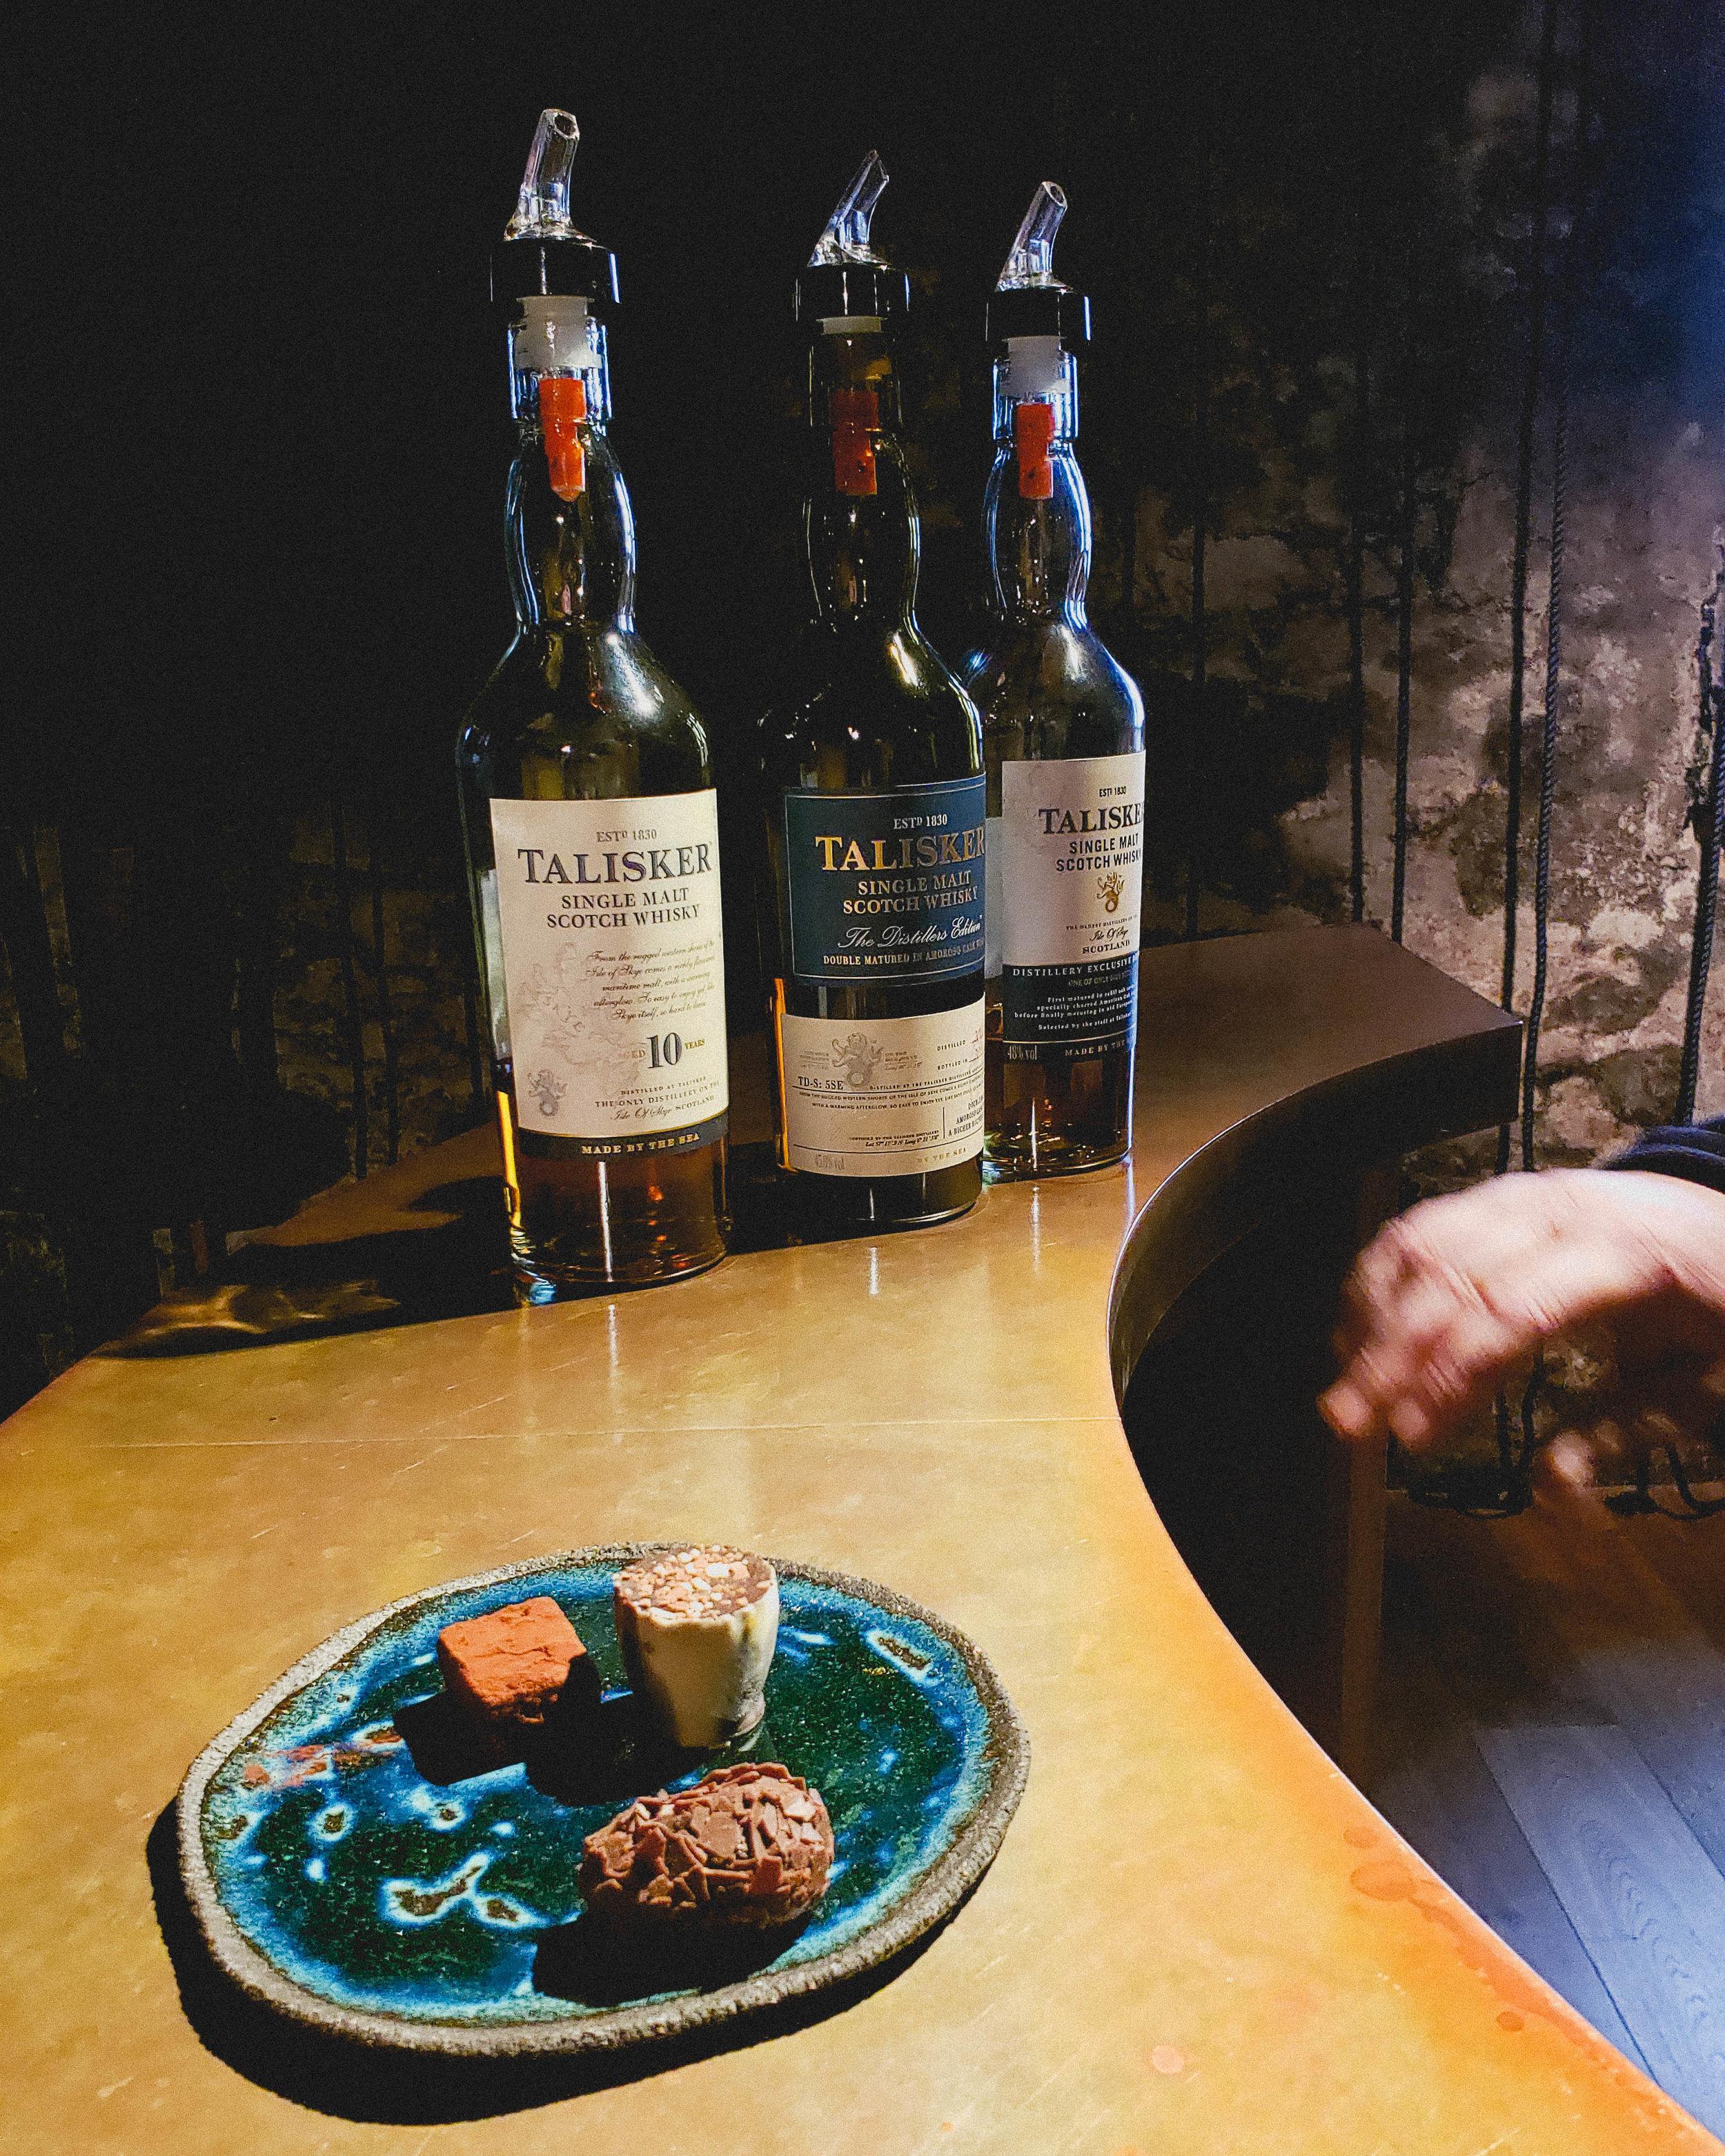 whisky and chocolate pairing.